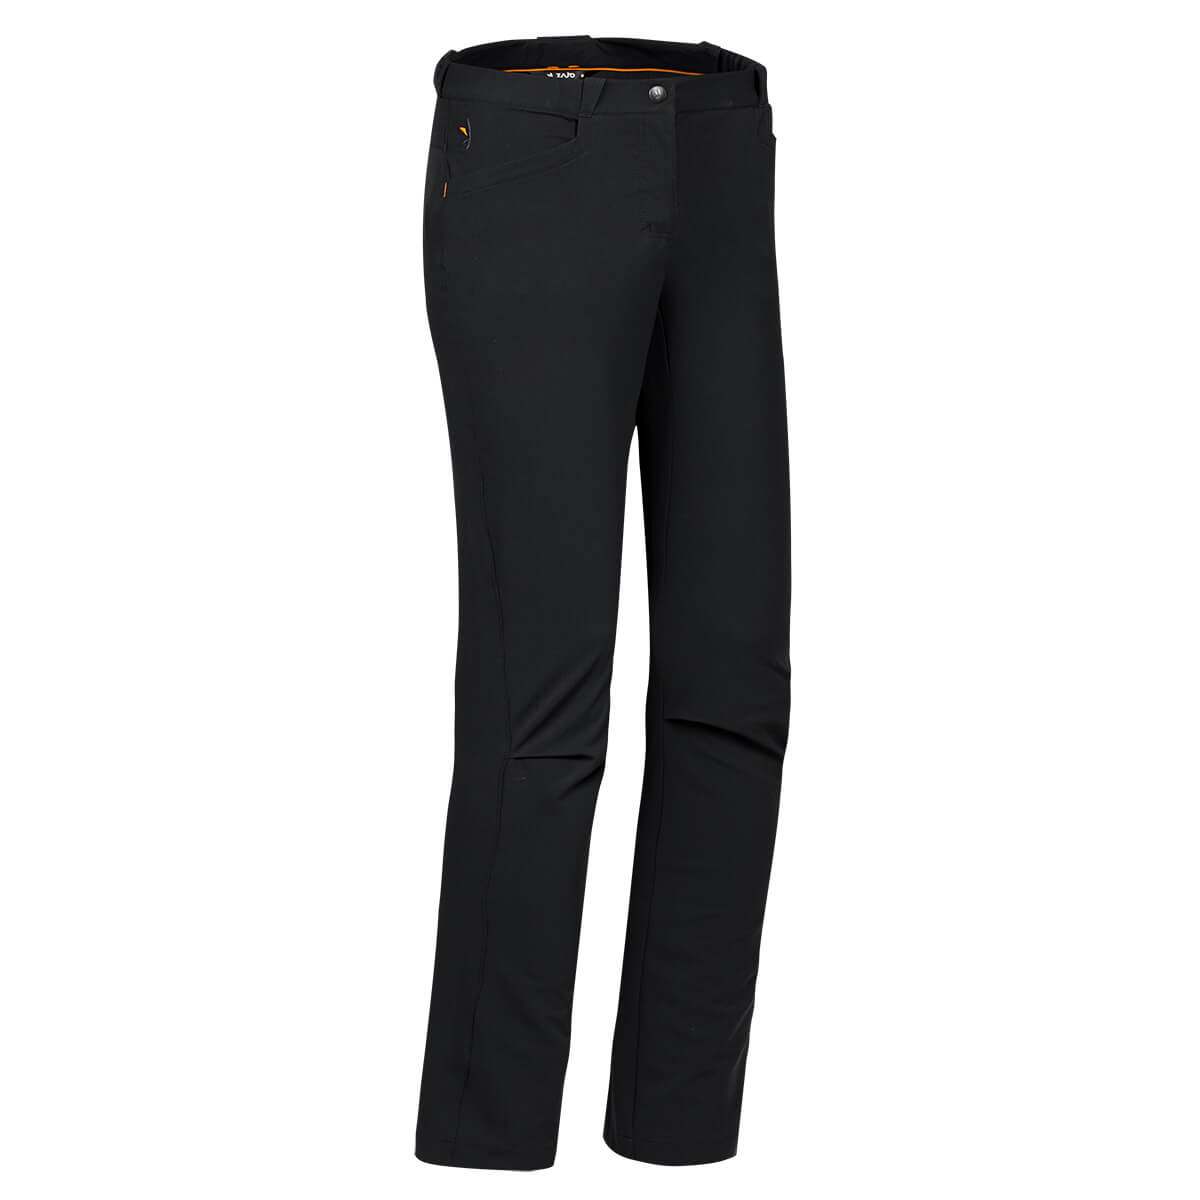 Nohavice Zajo Grip Neo W Pants Black - veľkosť XS